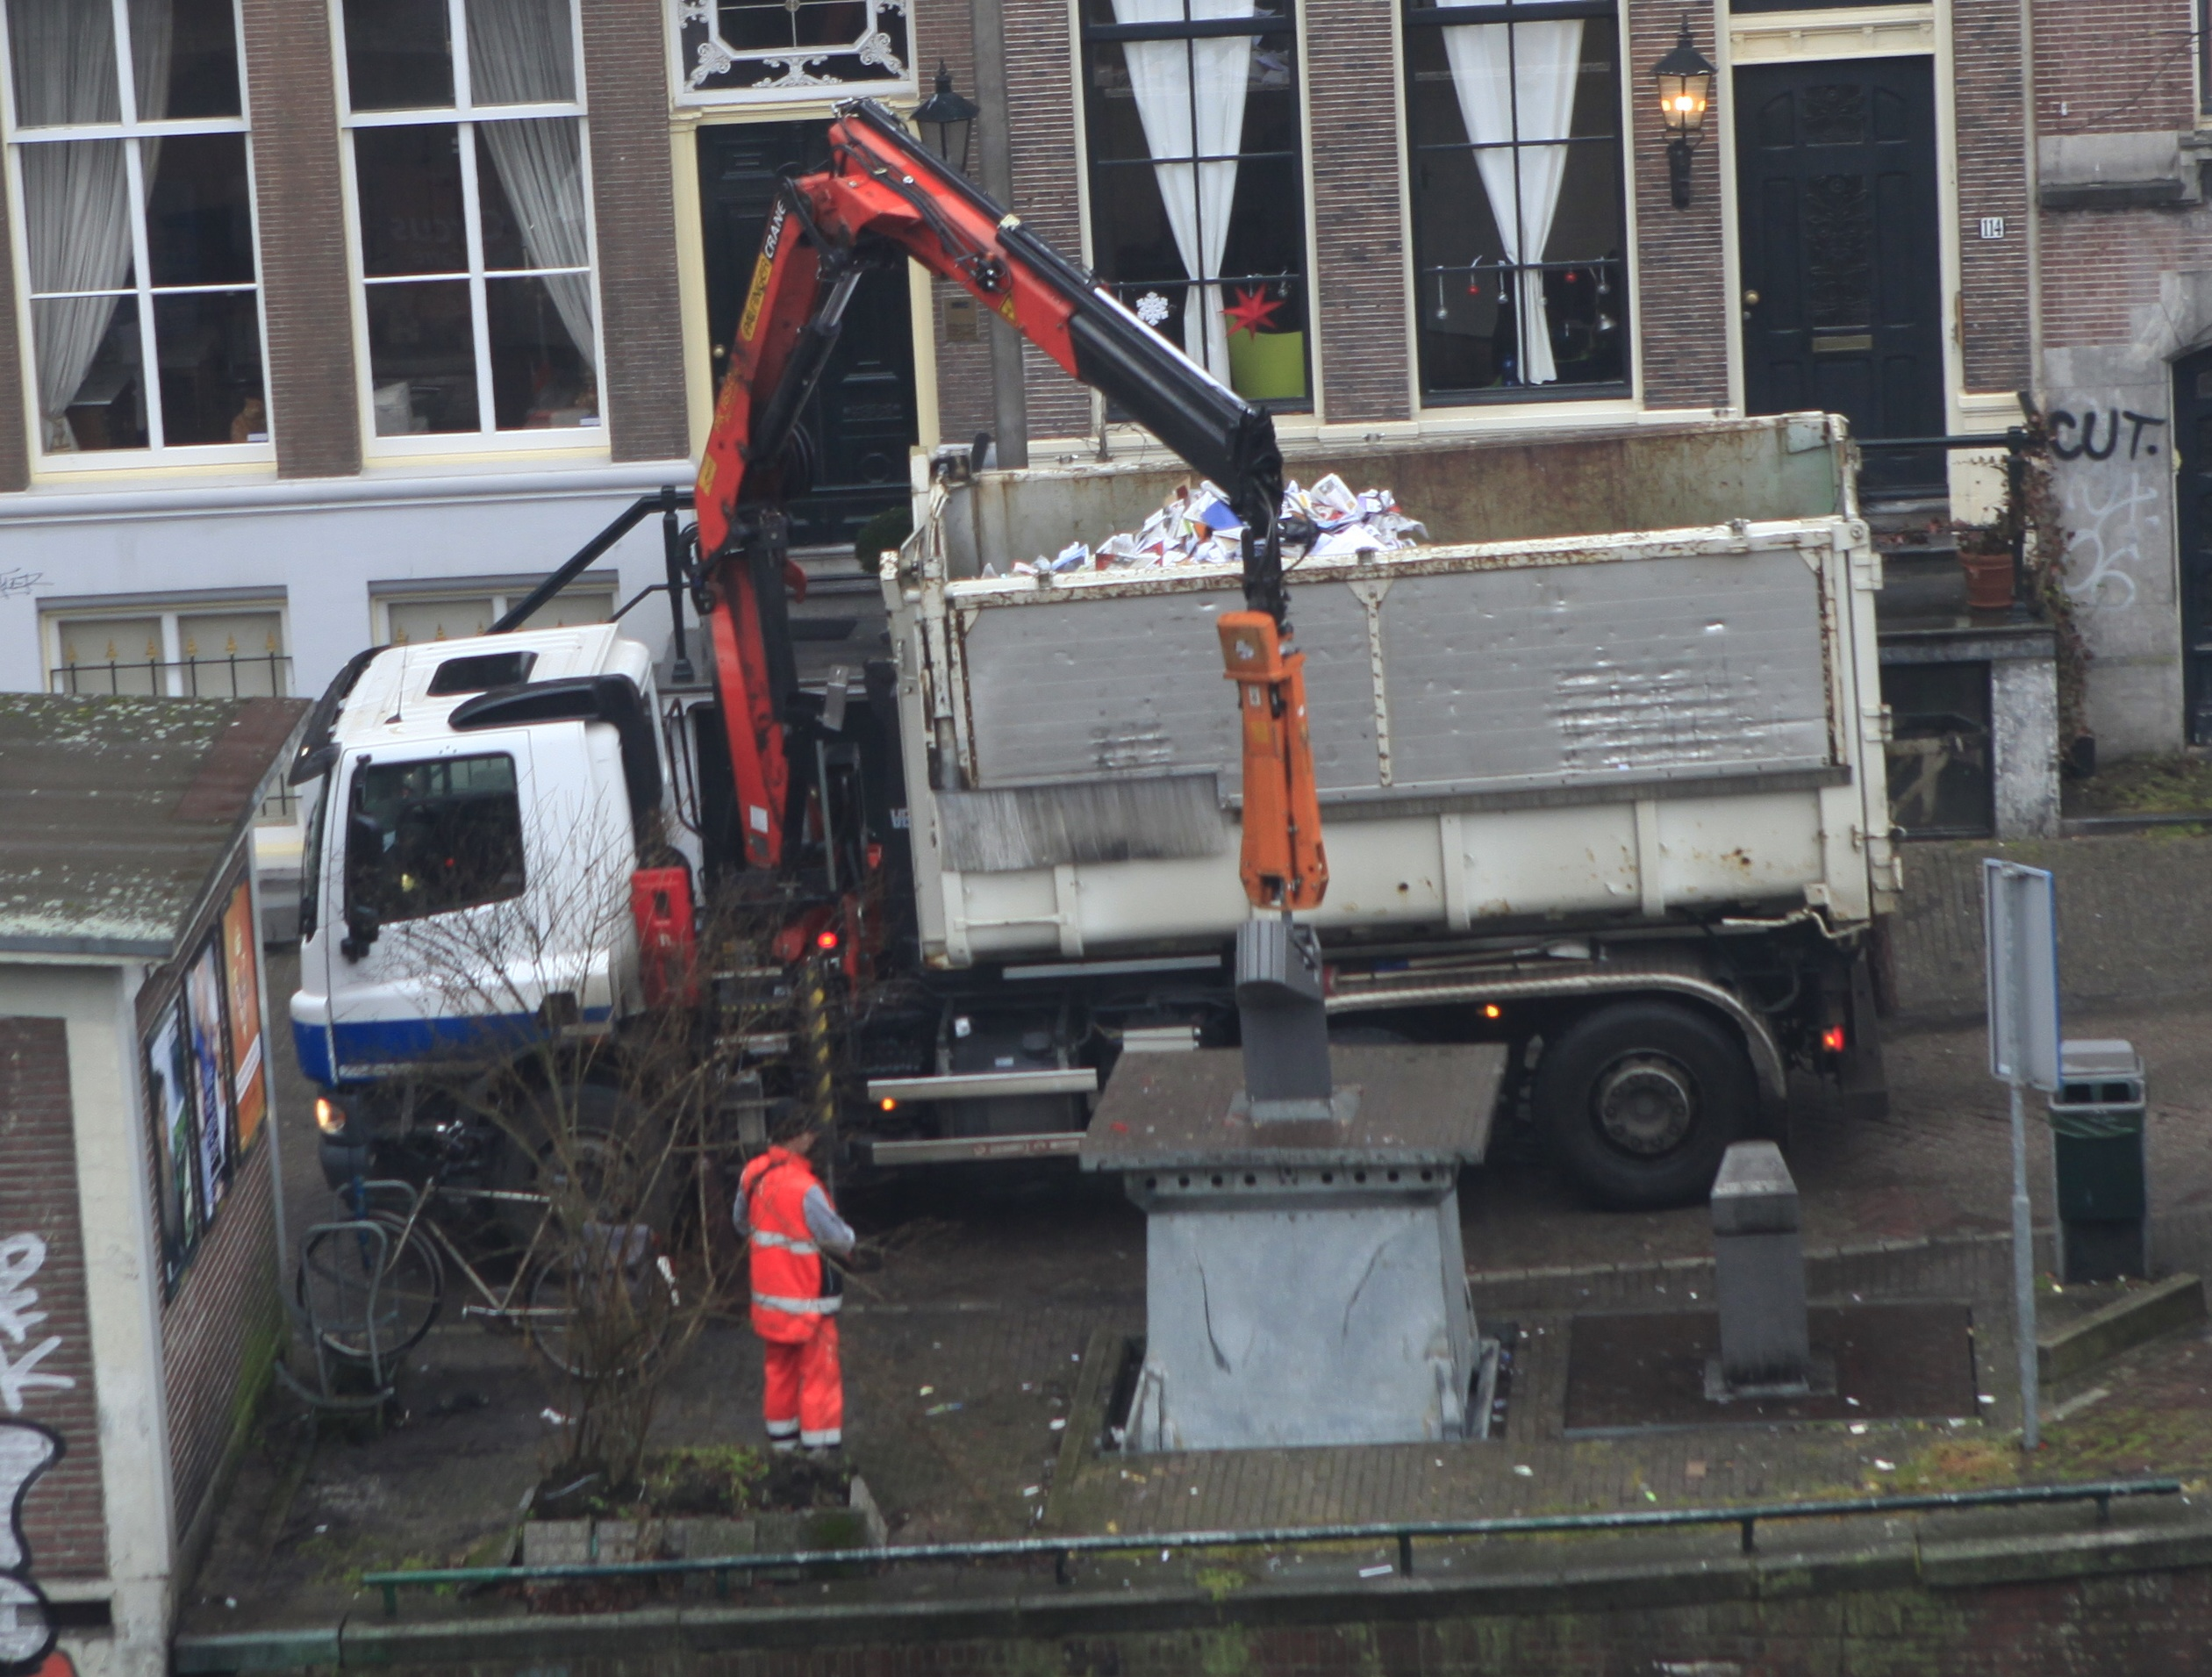 Amsterdam_recycling.jpg